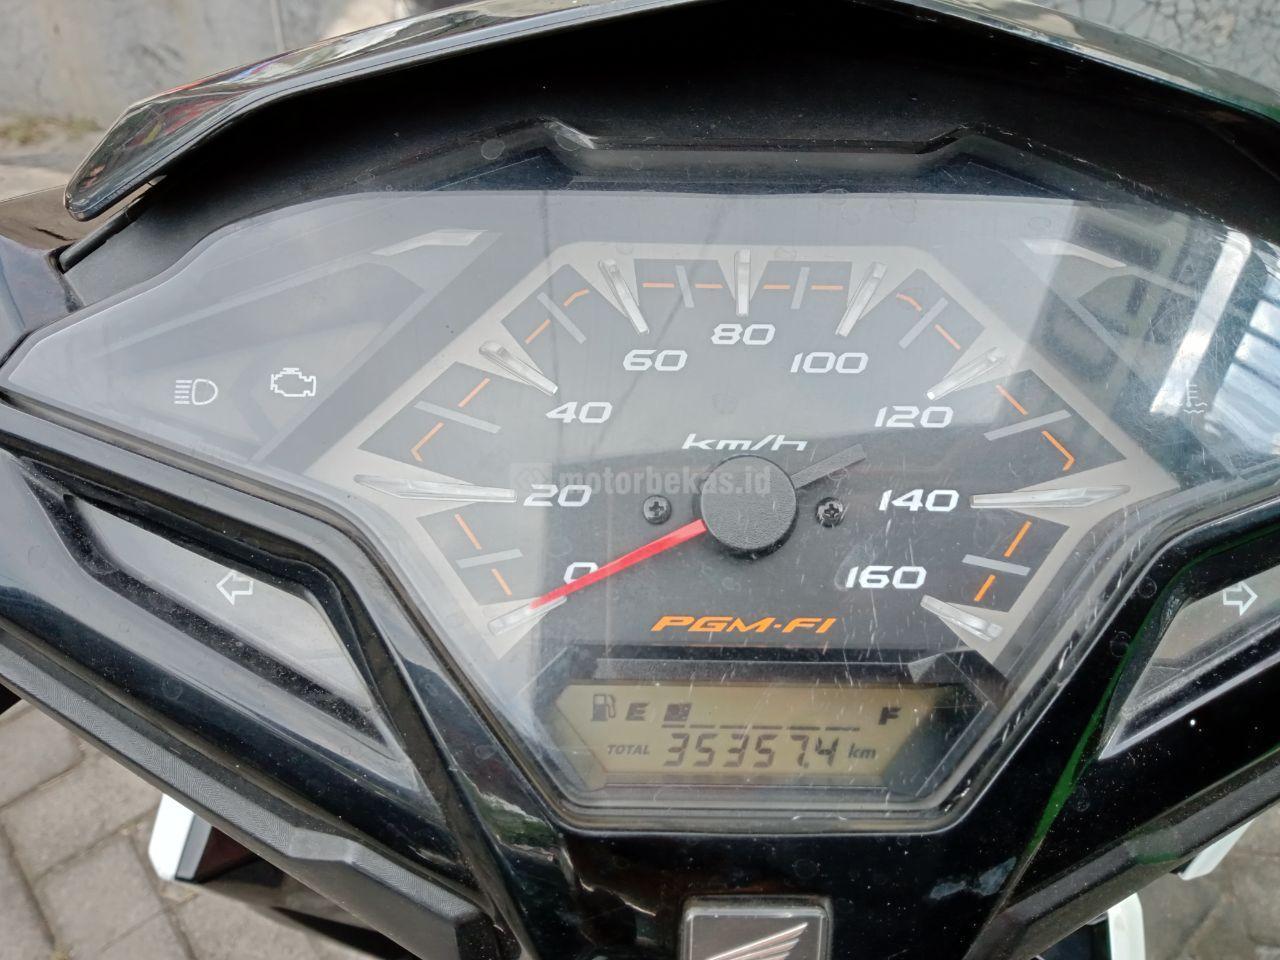 HONDA VARIO 125 FI 3204 motorbekas.id